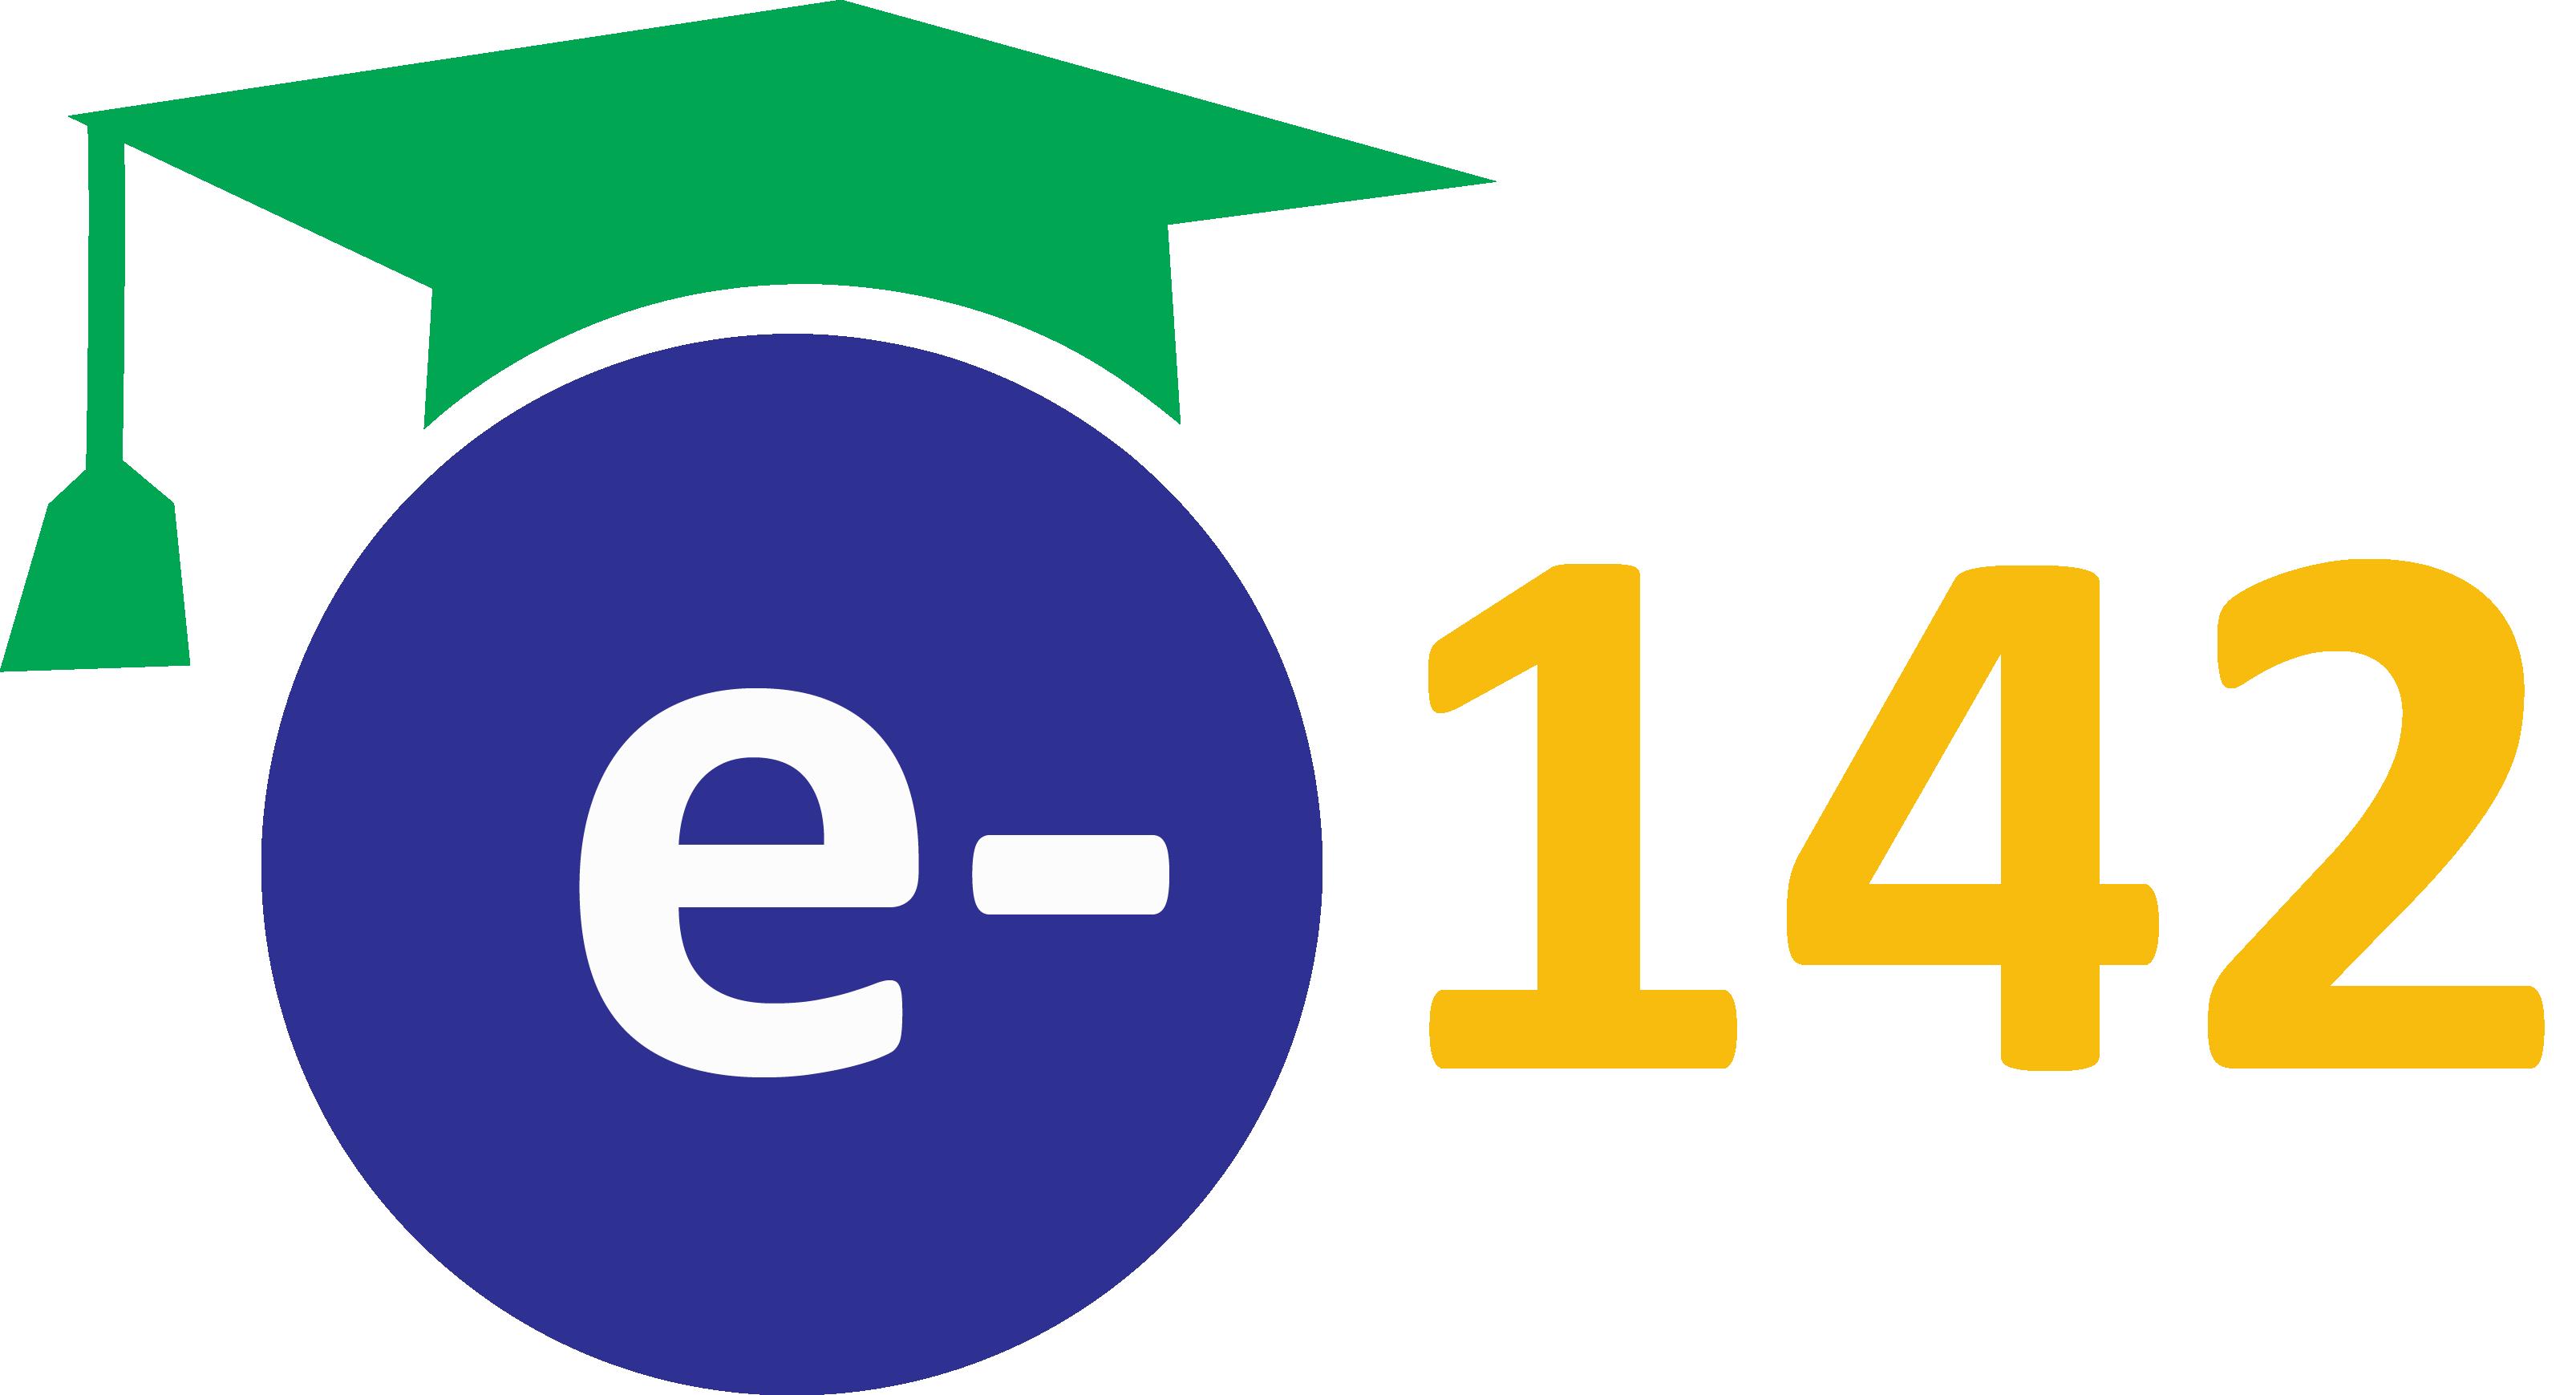 e-142